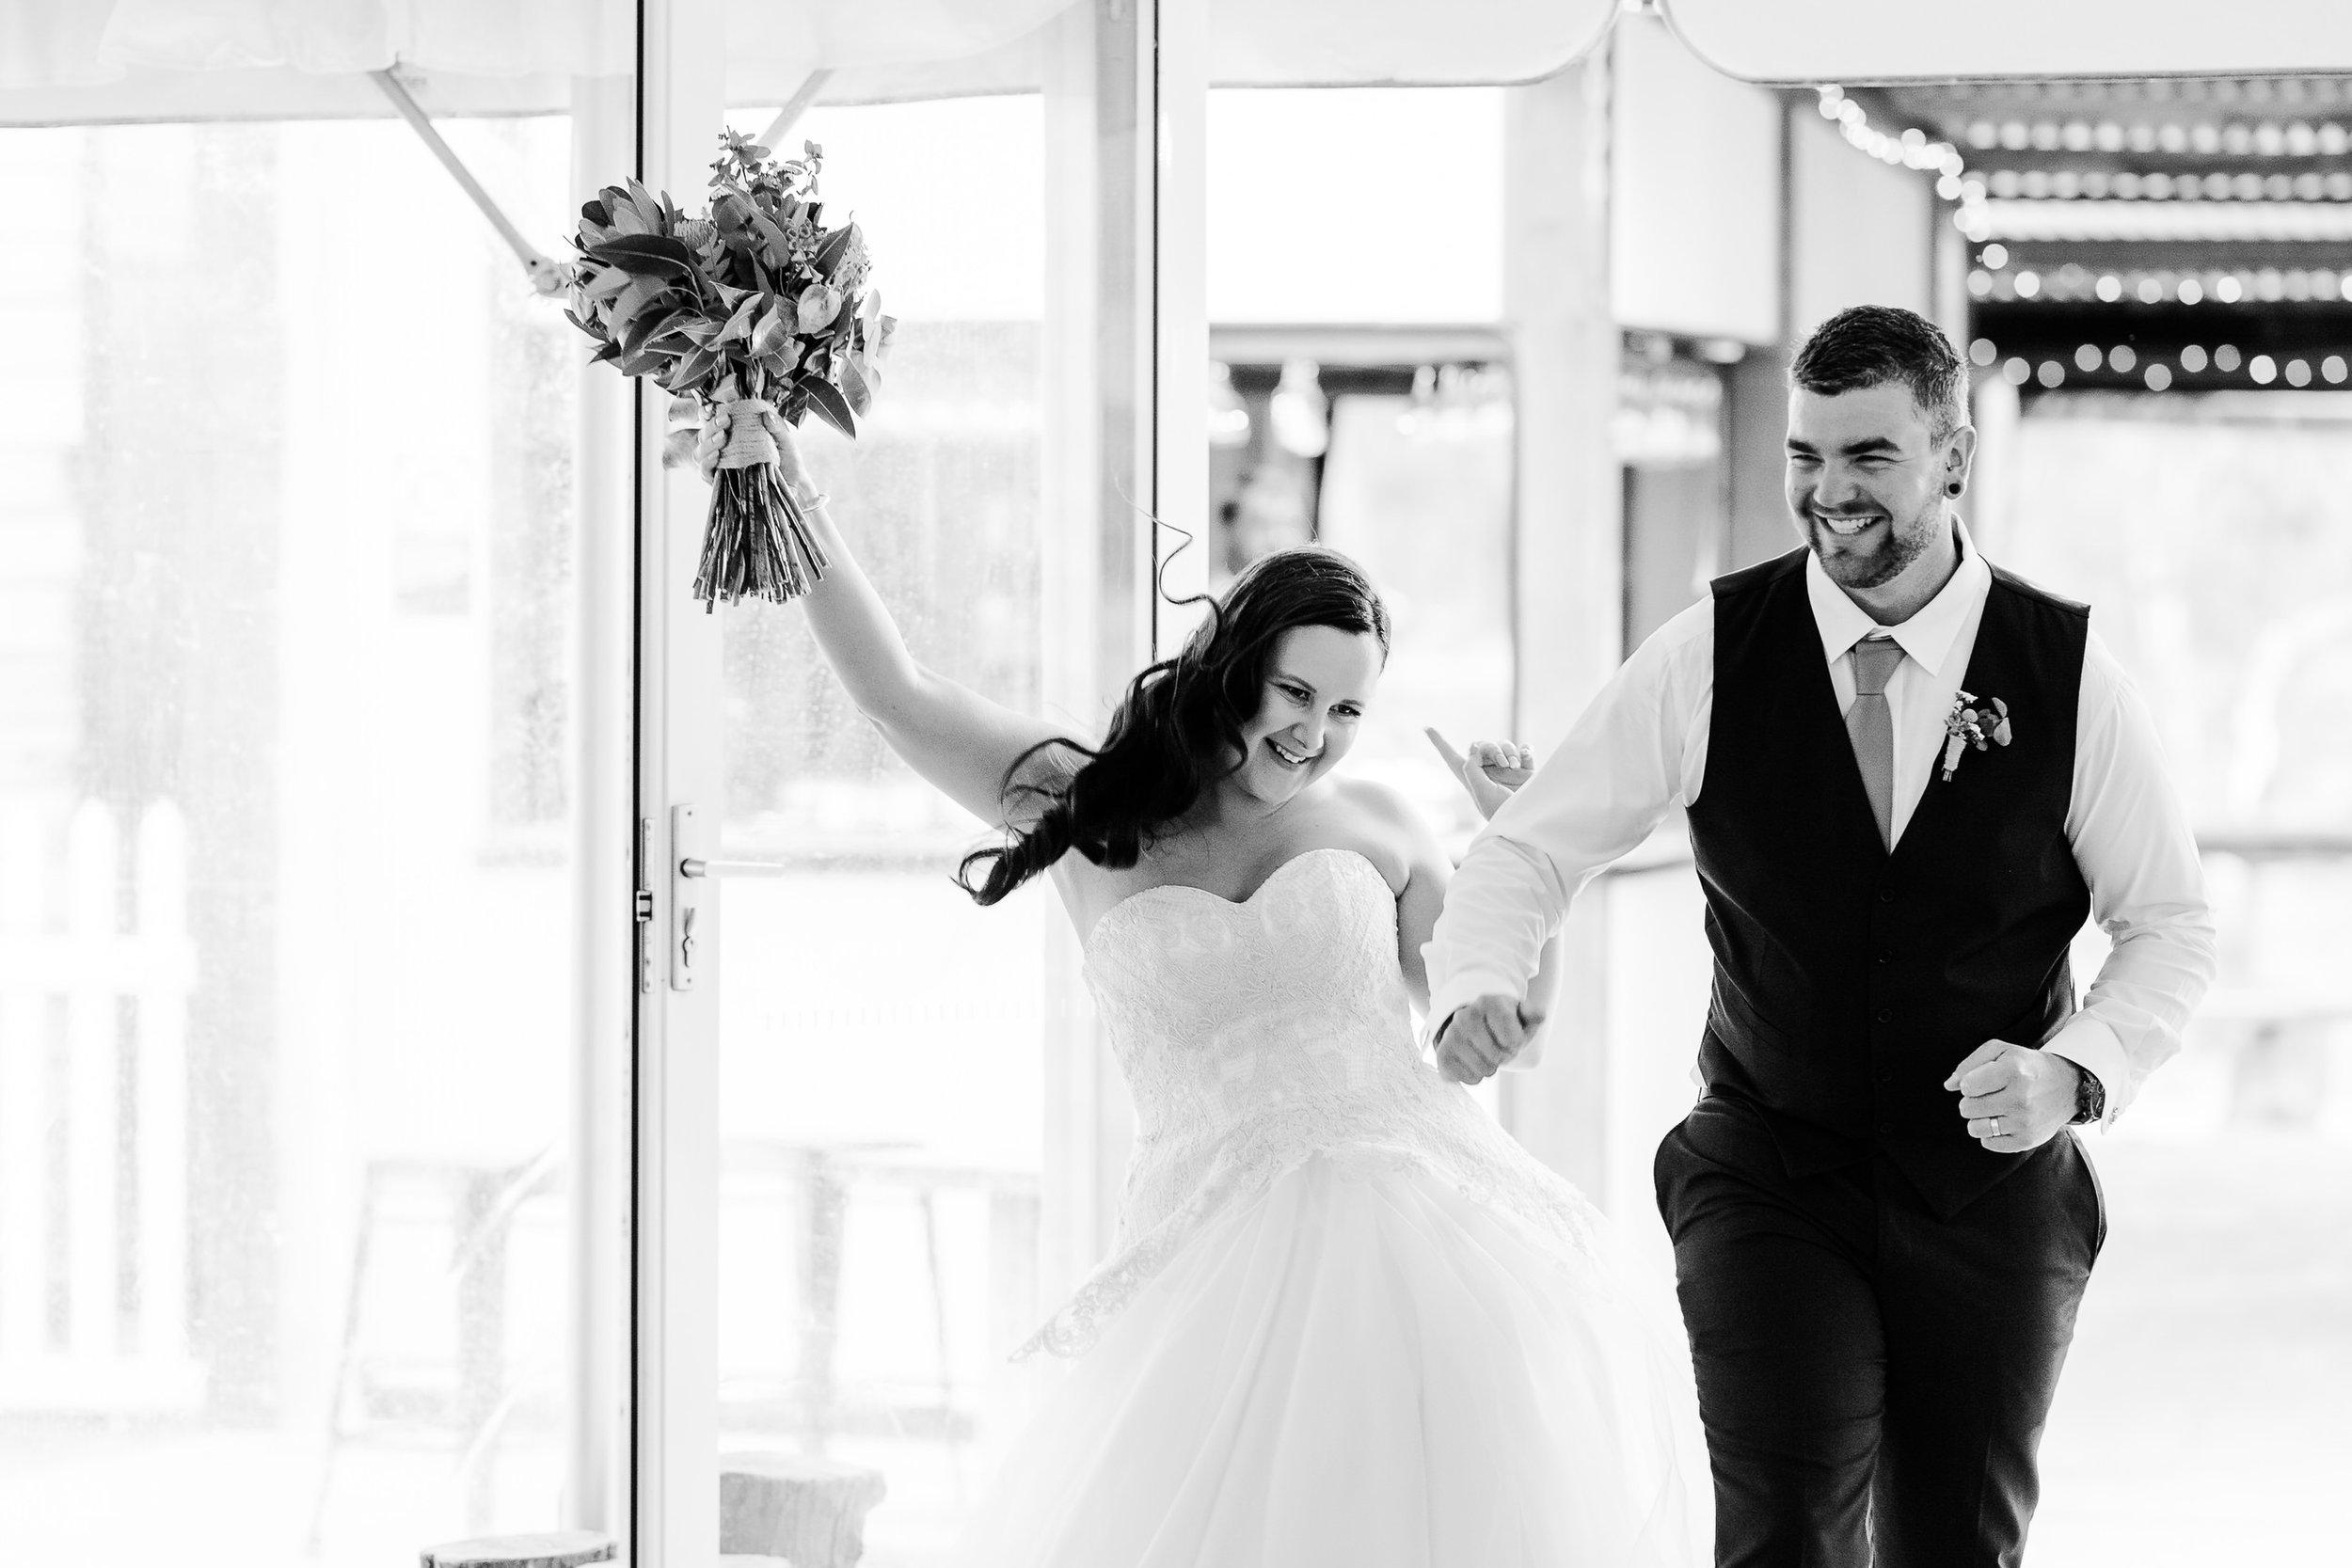 Justin_Jim_Echuca_Wedding_Photography_Tindarra-279.JPG